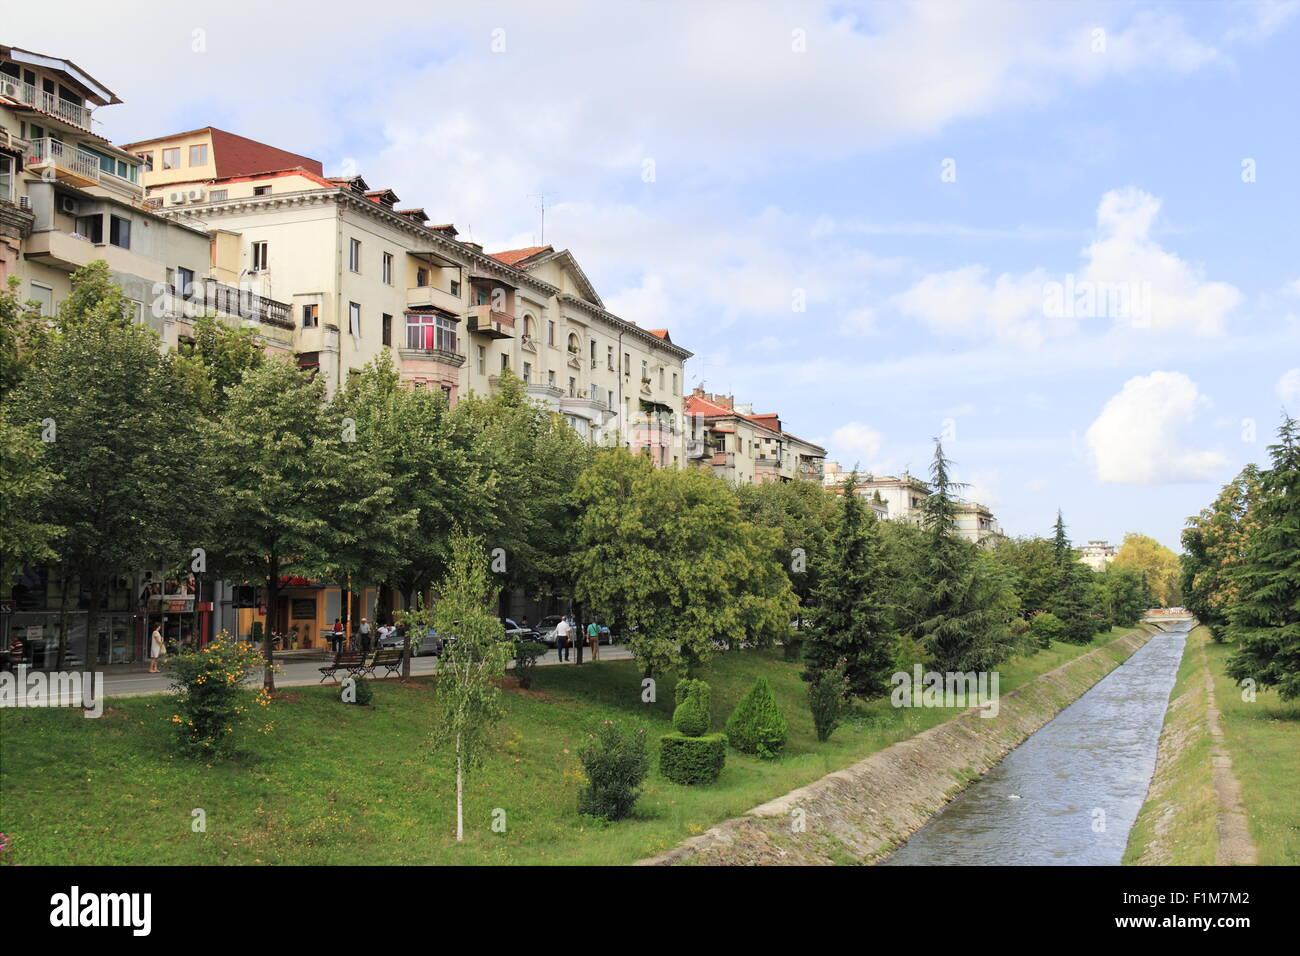 River Lana, Bulevardi Bajram Curri, Tirana, Albania, Balkans, Europe - Stock Image